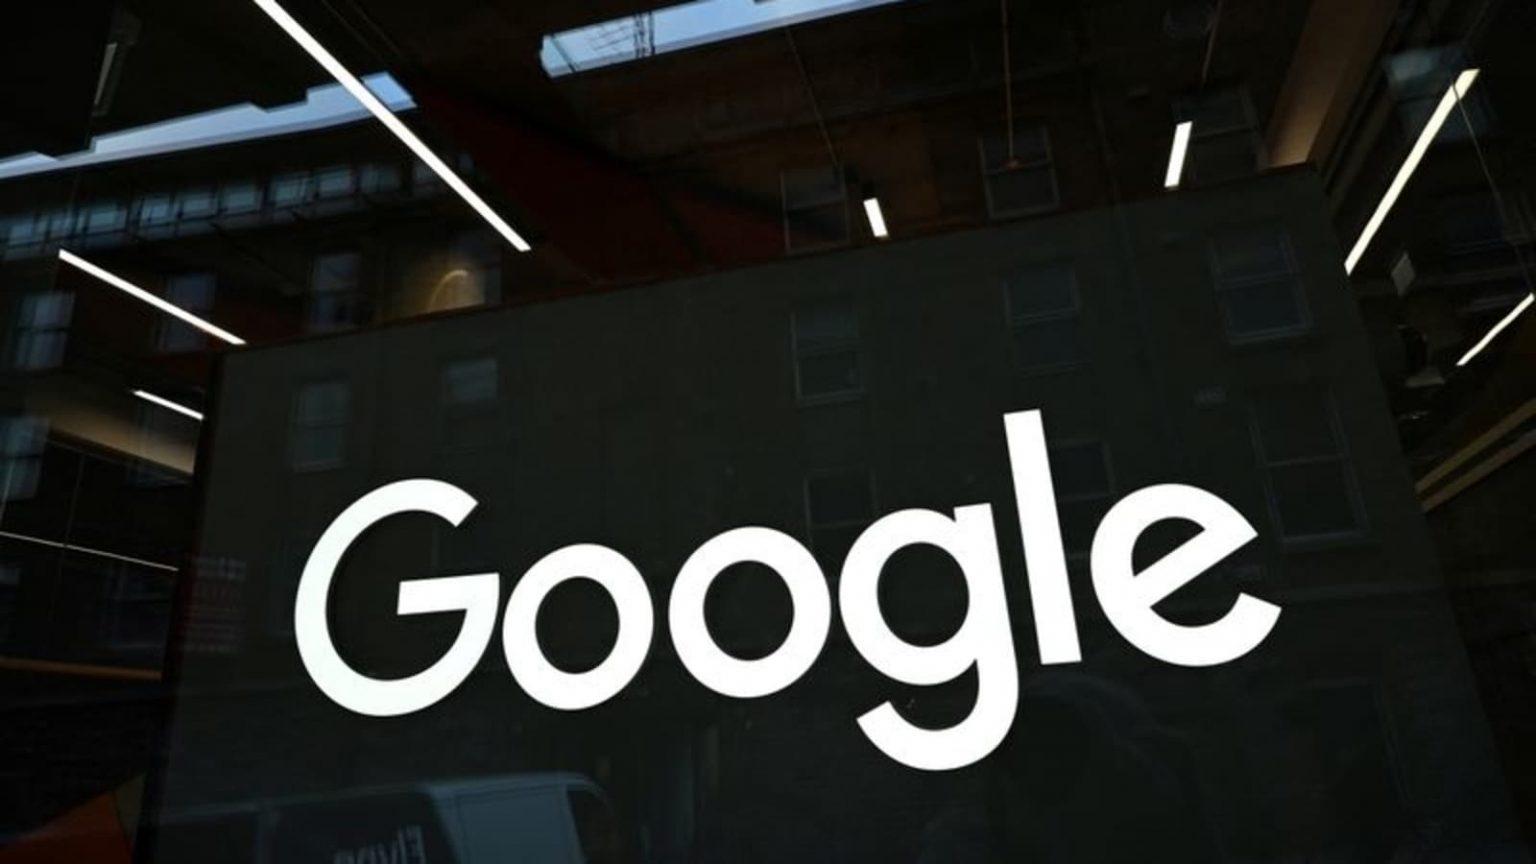 Google floats News Showcase in India with top publishers   గూగుల్ భారతదేశంలోని అగ్ర ప్రచురణకర్తల సహకారంతో వార్తలను ప్రచురించనుంది  _40.1